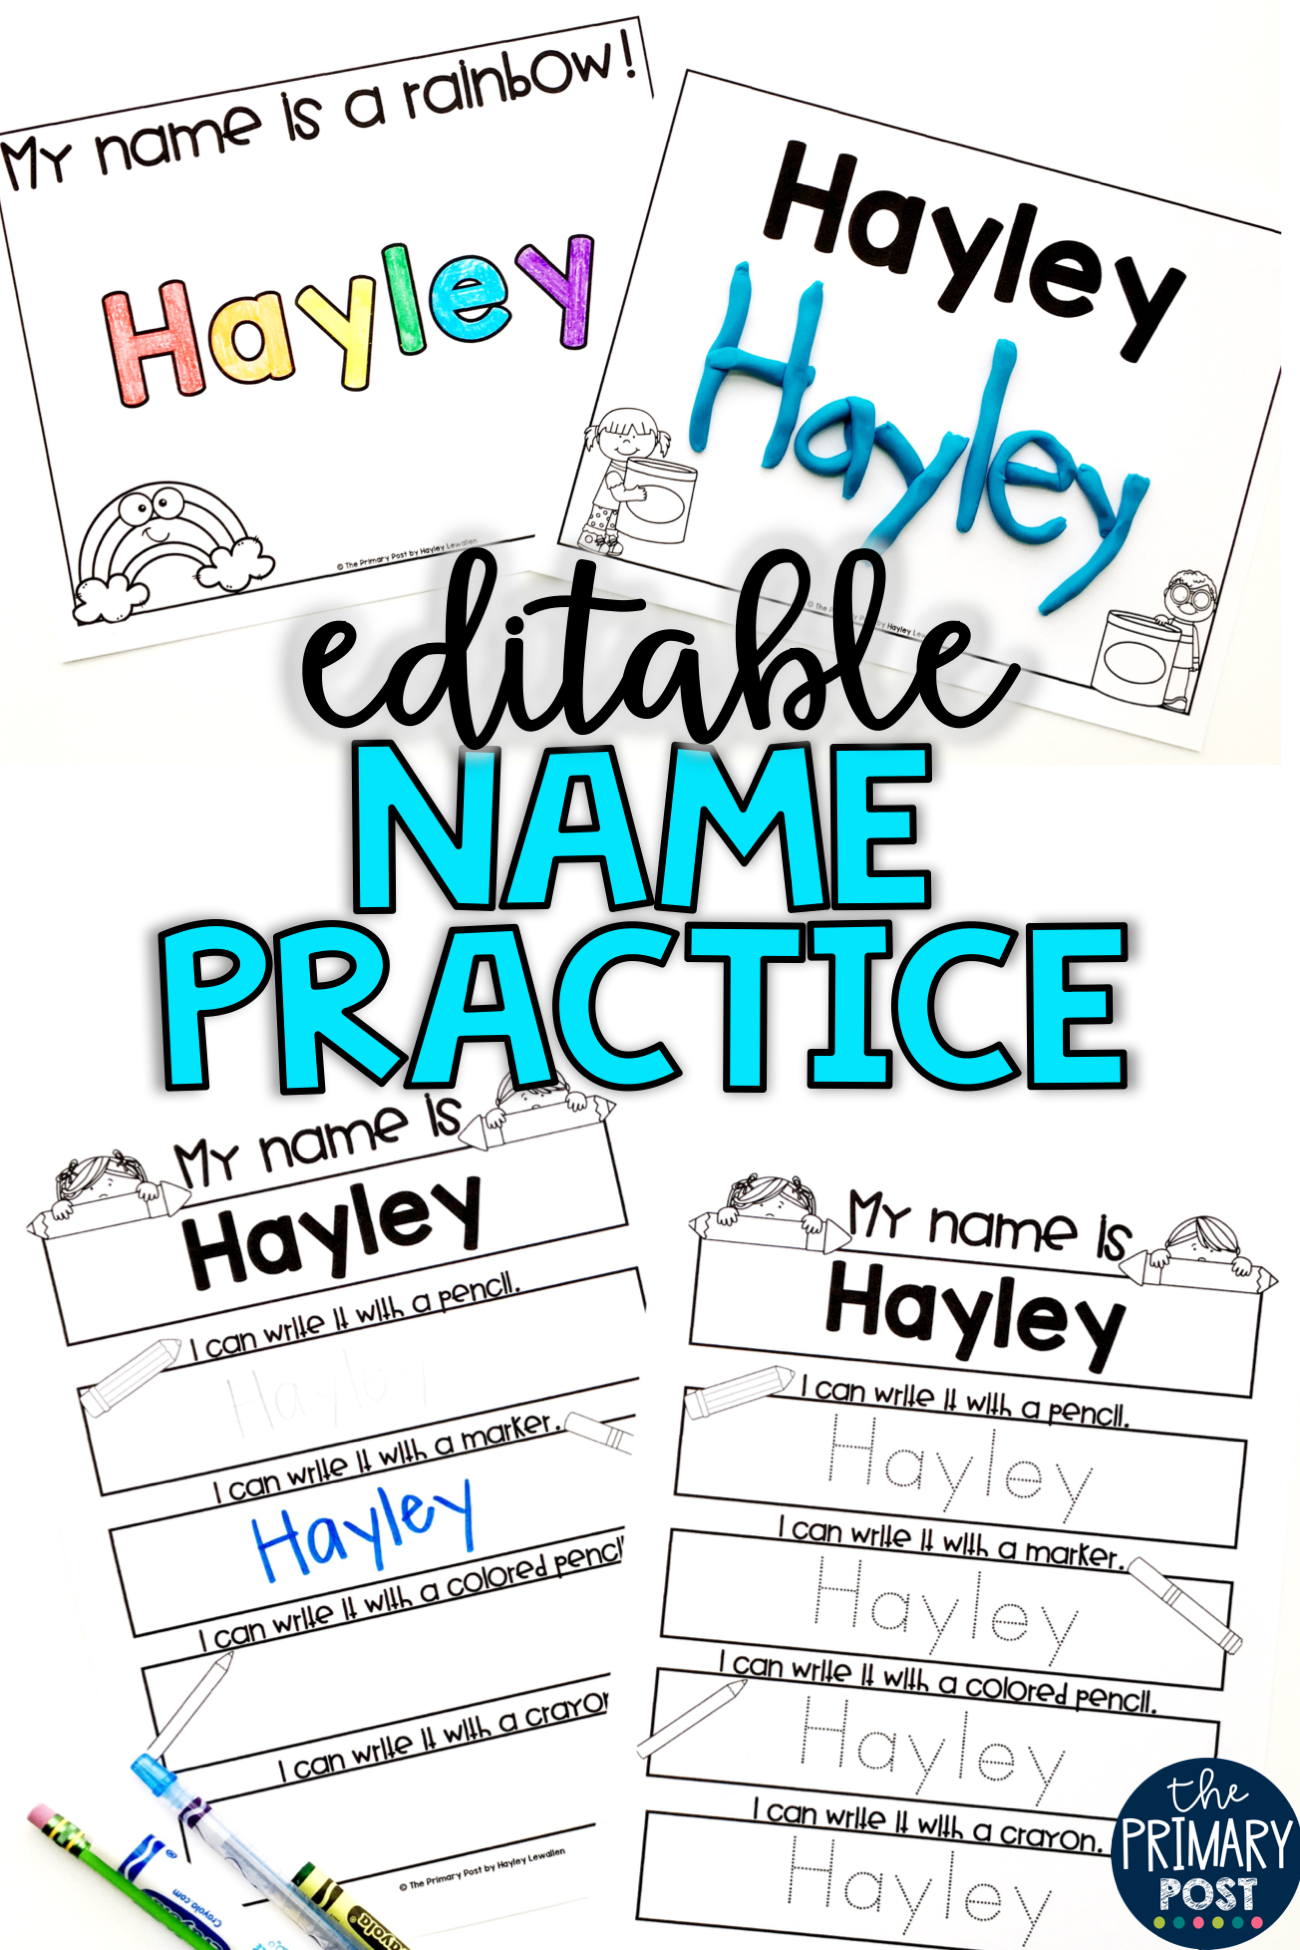 Editable Name Practice Sheets Name Practice Practice Sheet Writing Practice [ 1950 x 1300 Pixel ]